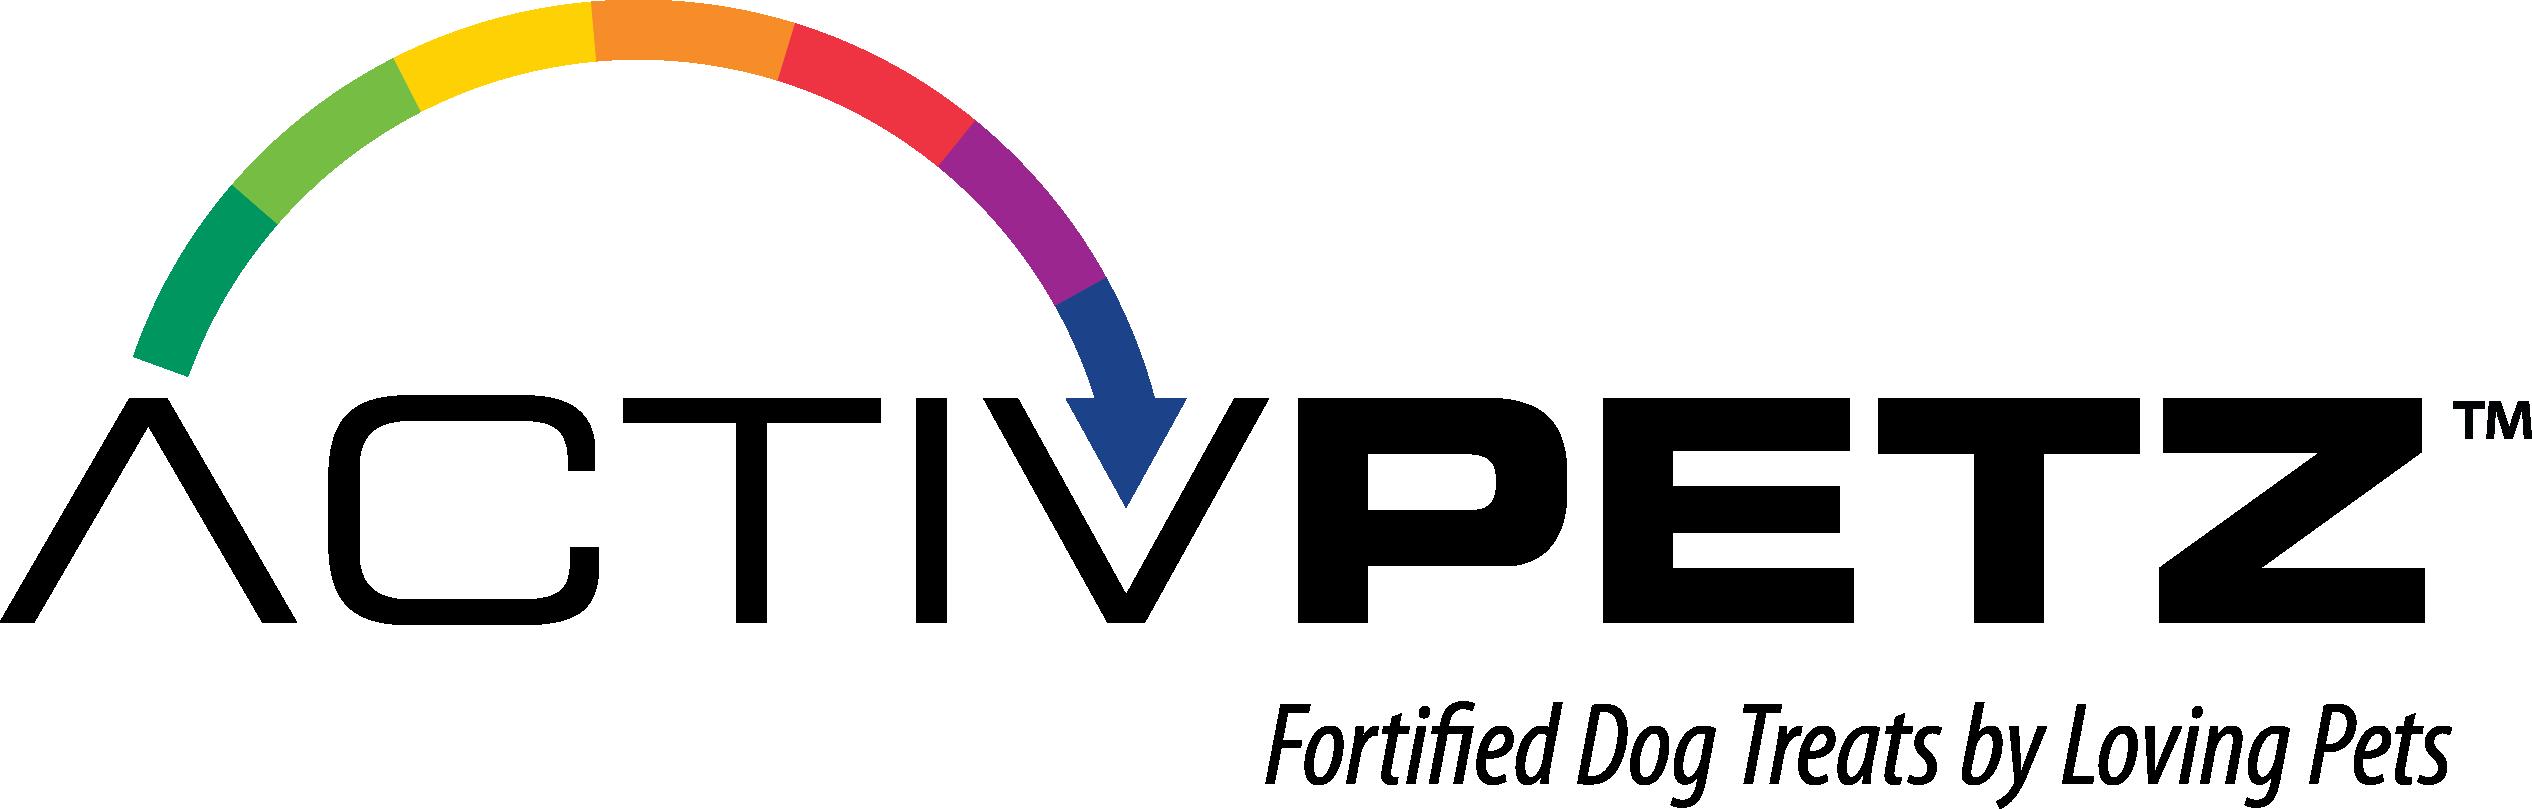 Activpetz Logo Image